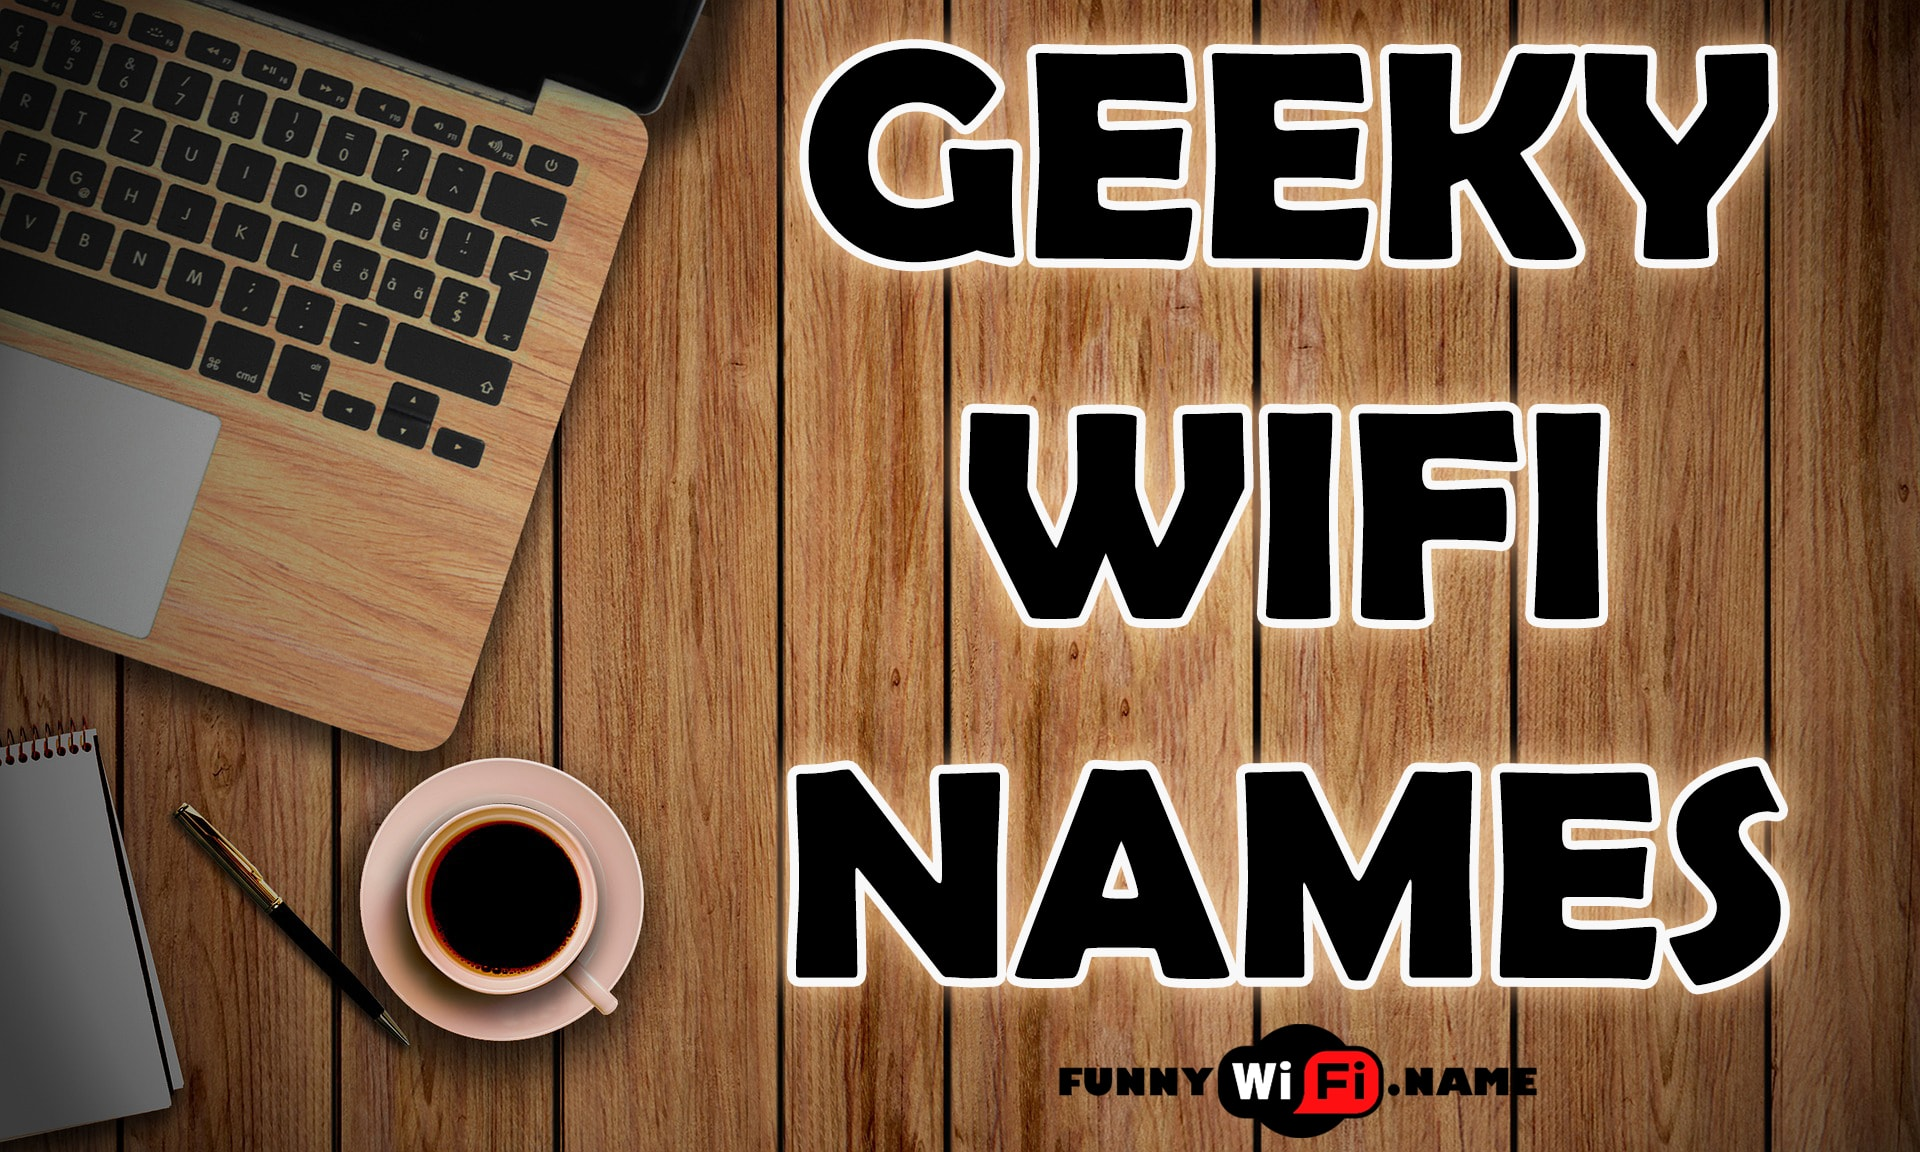 Geeky WiFi Names